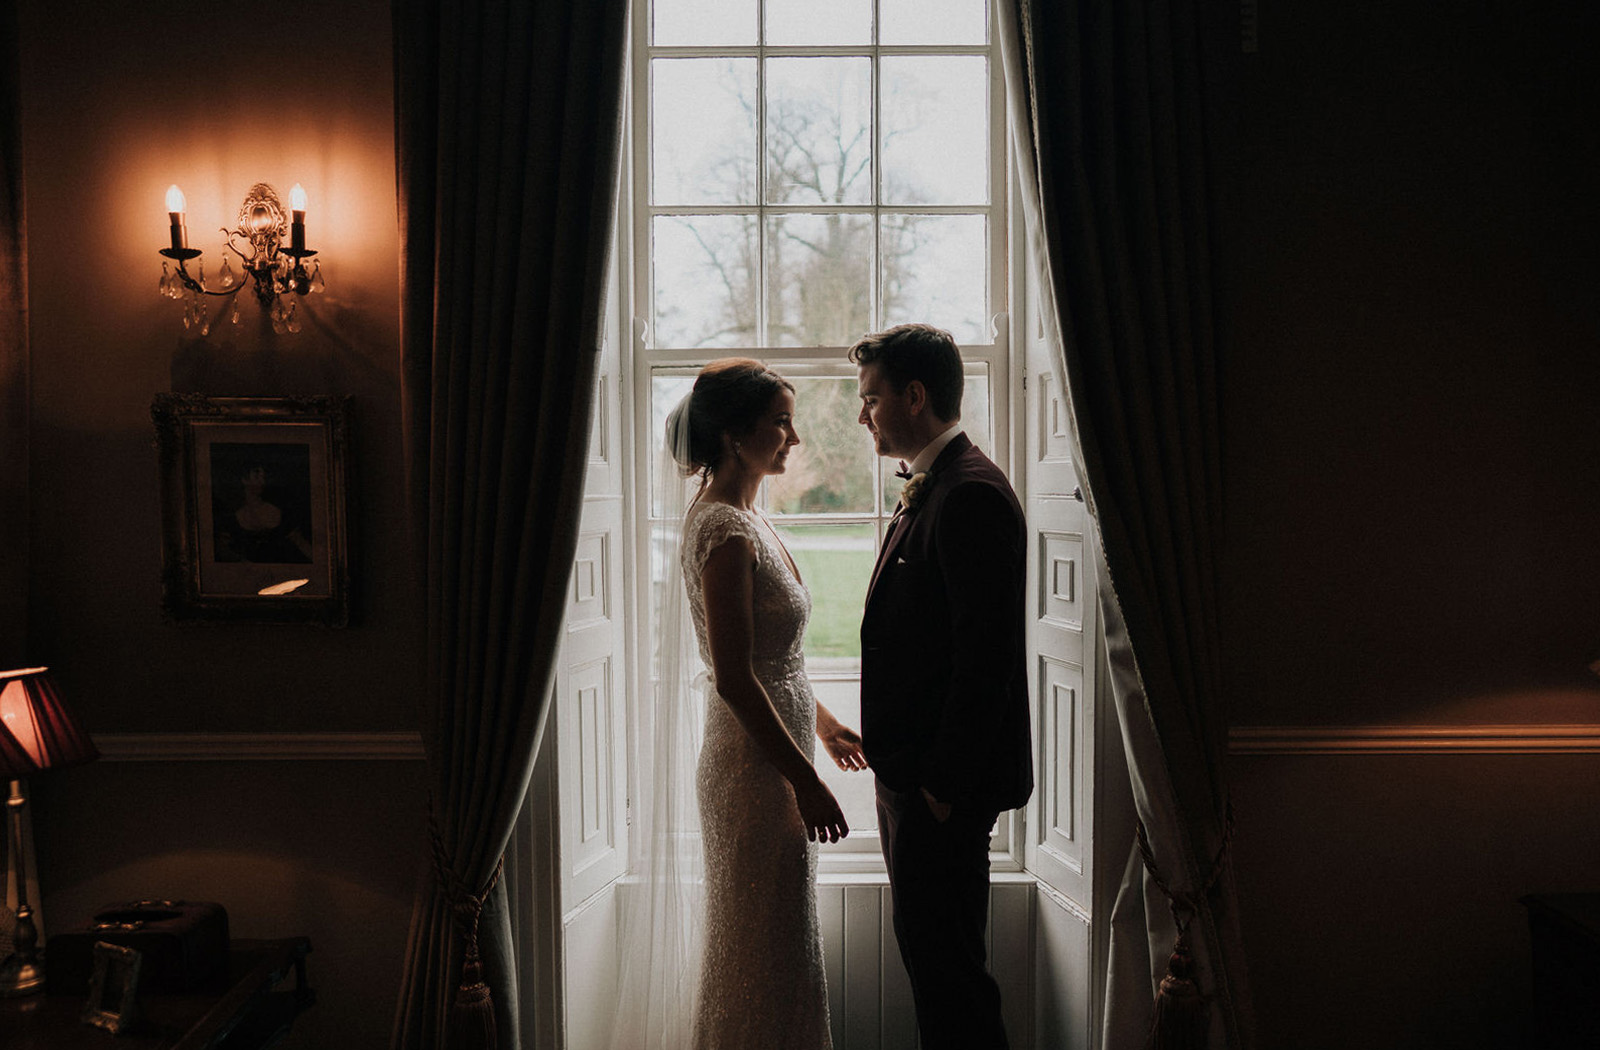 Dodumentary-wedding-photographer-Ireland 1